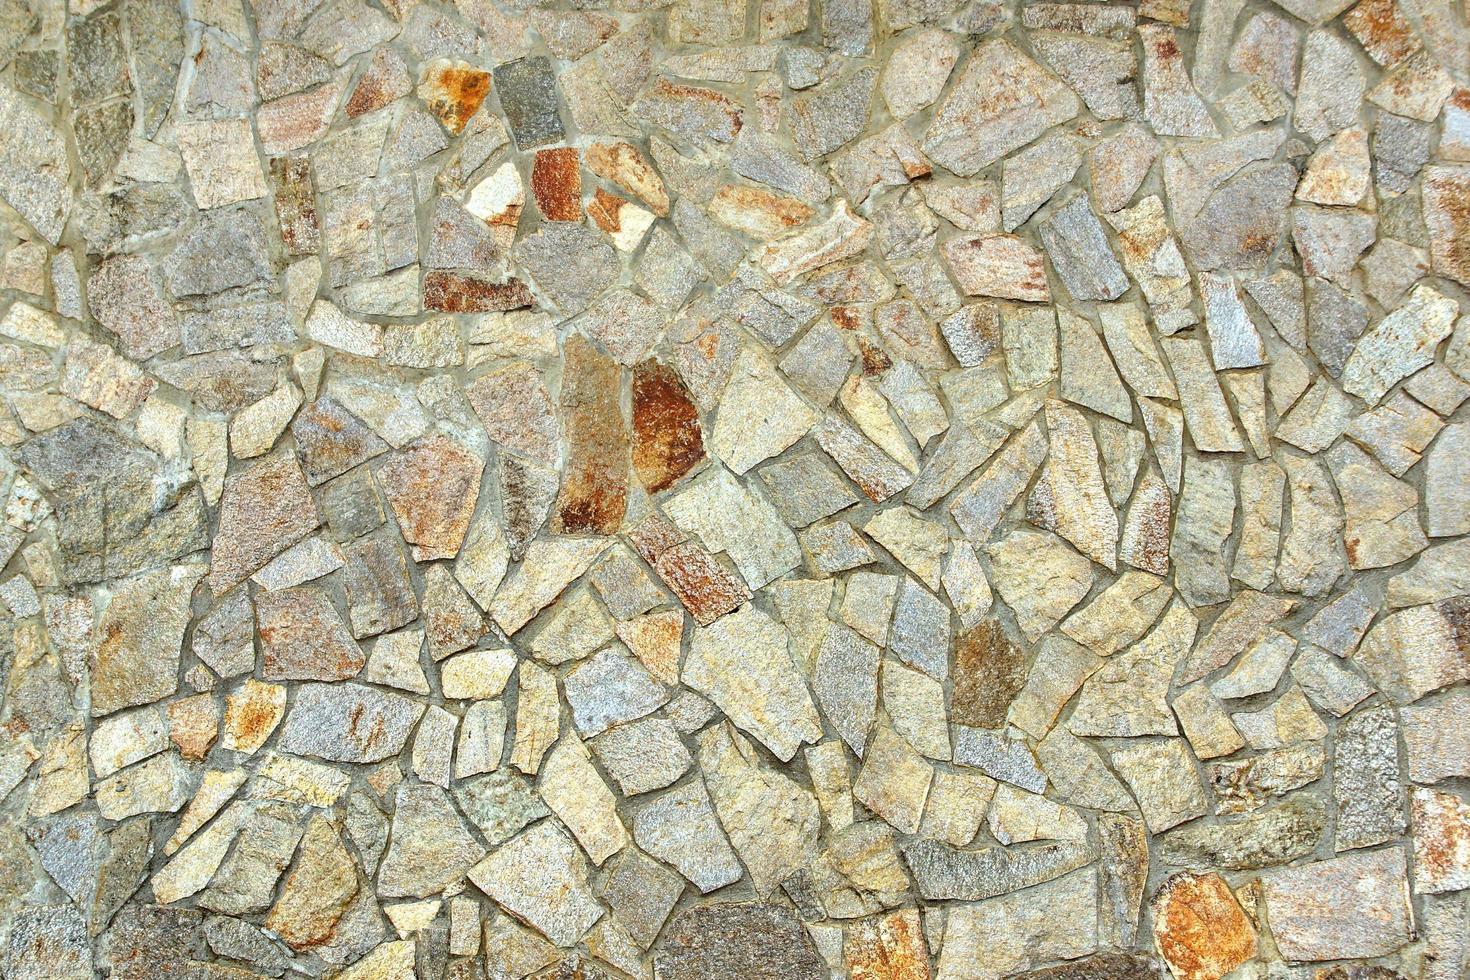 Fondo de pared de piedra antigua decorativa foto